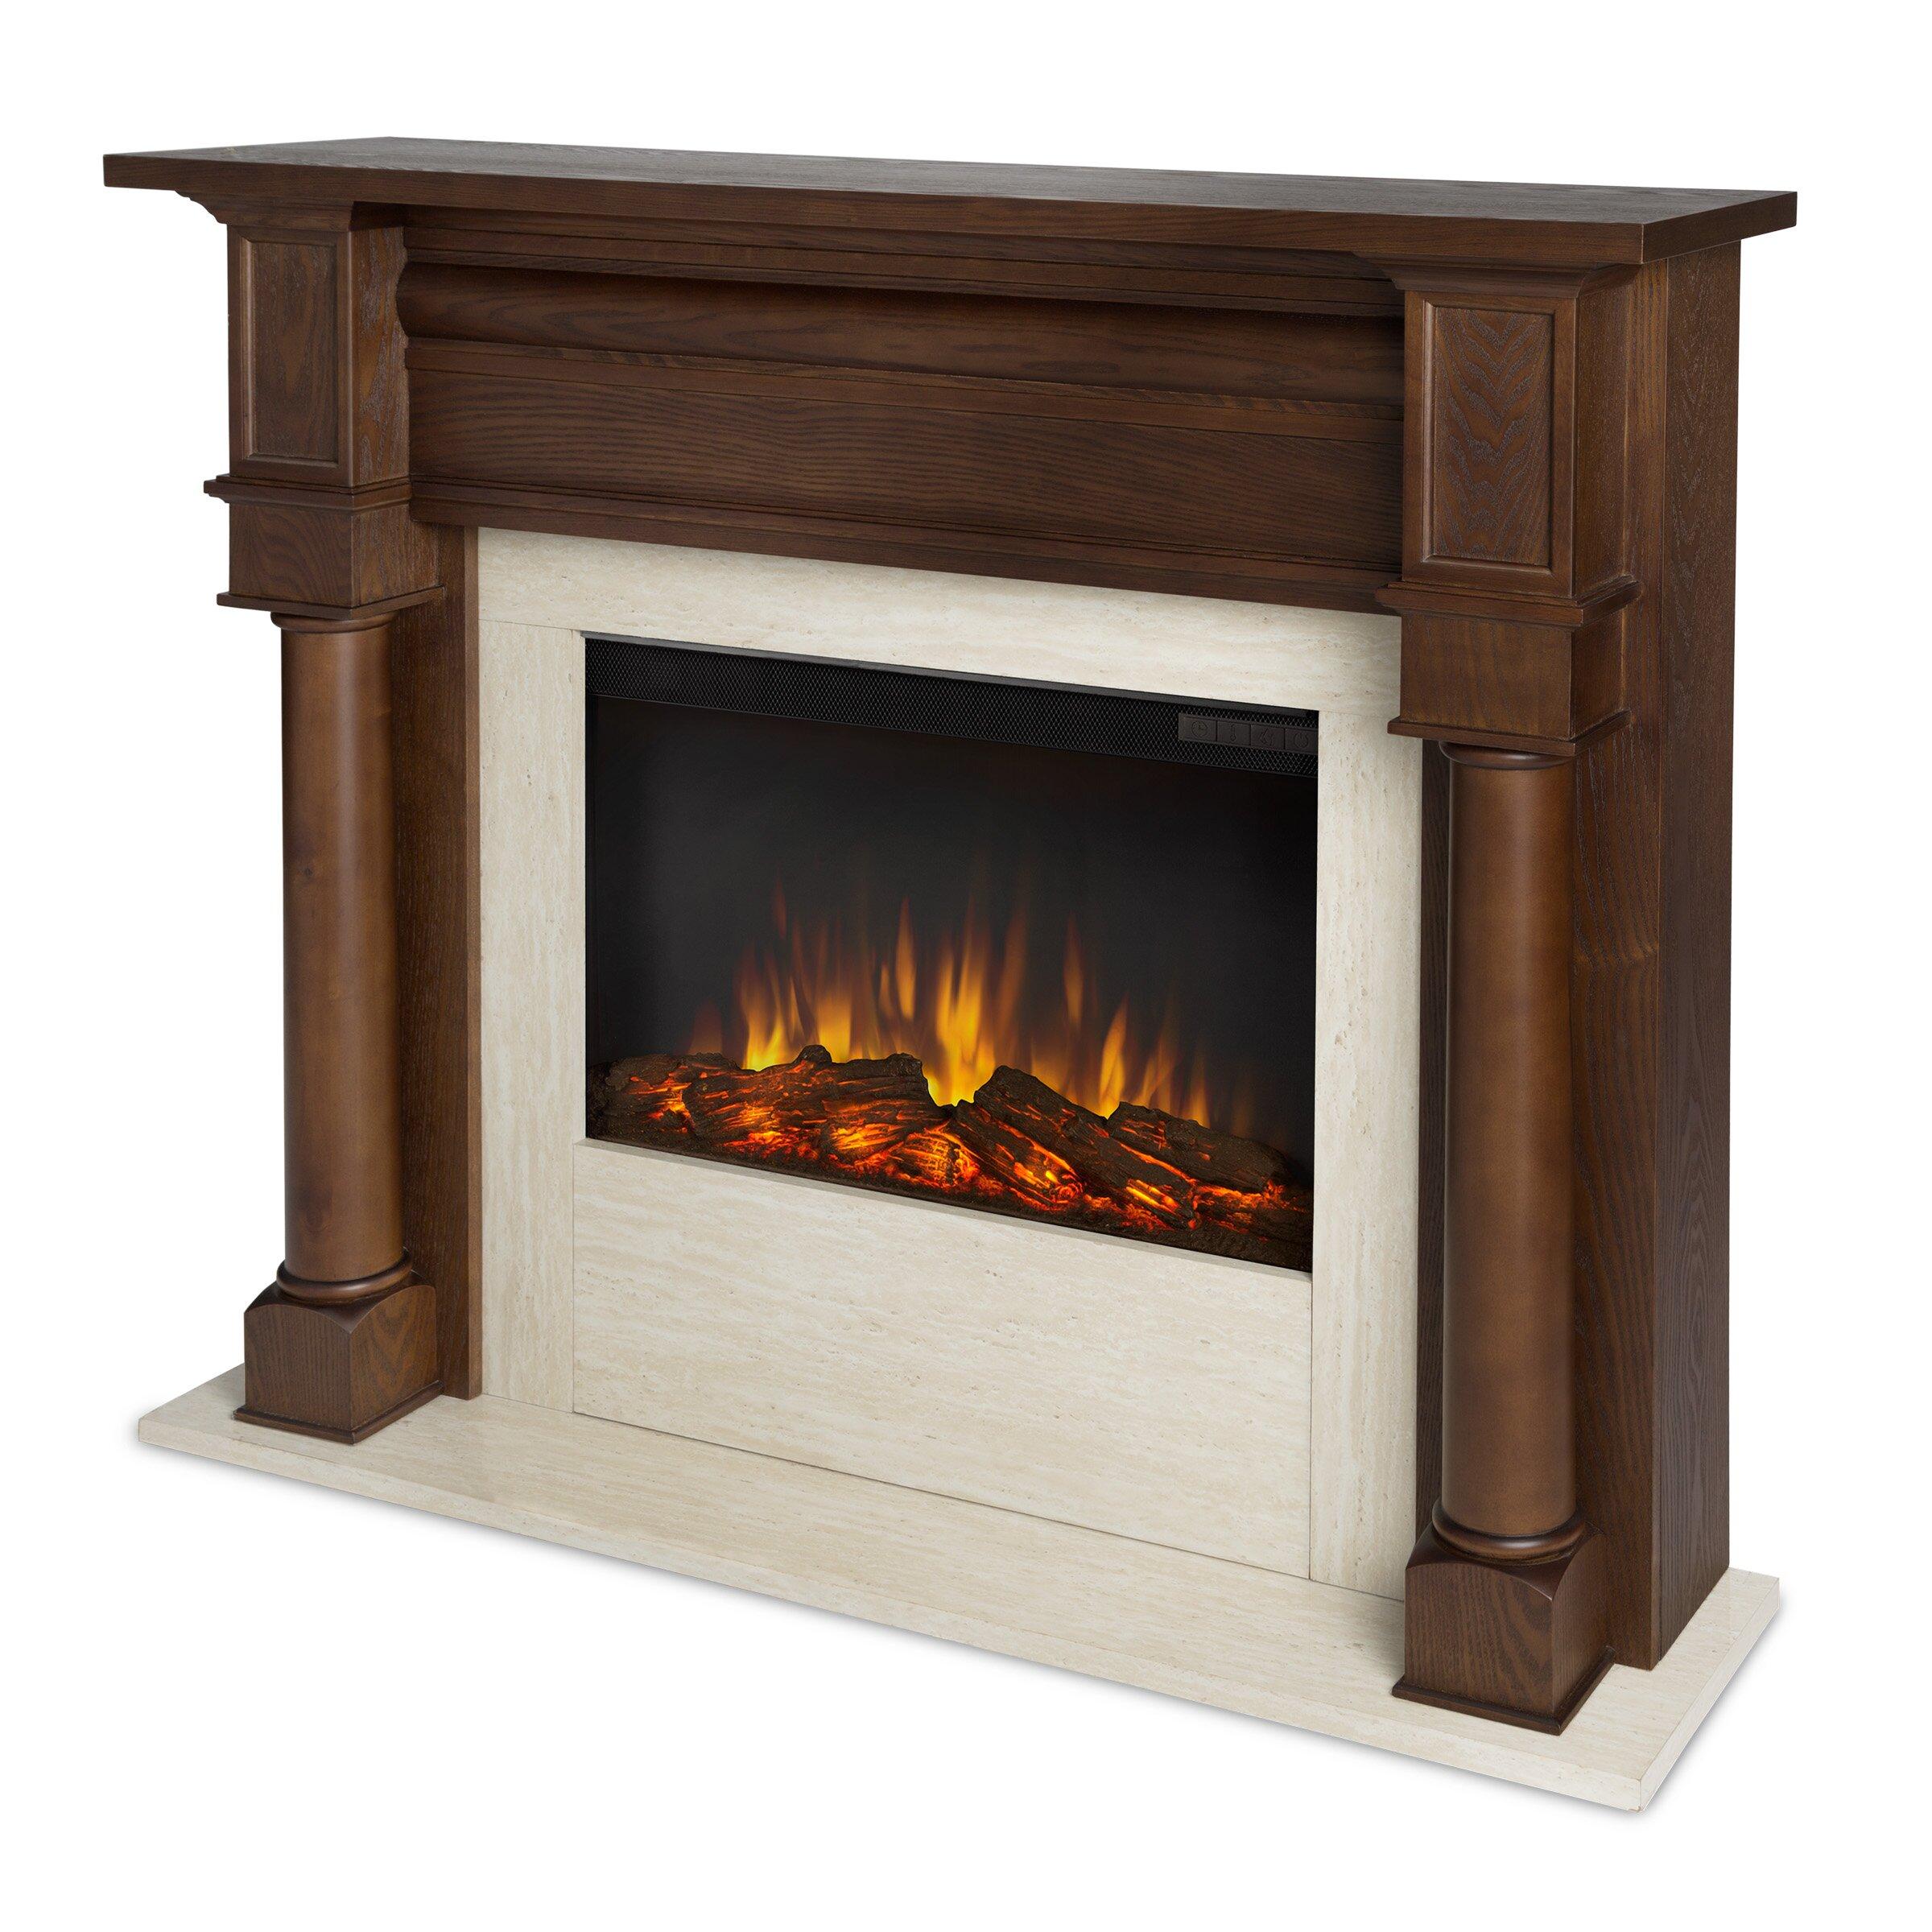 Fireplace Doors Omaha Descargas Mundialescom. Fireplace Omaha Fireplaces   Baltazars Stone Fireplace Gas Log